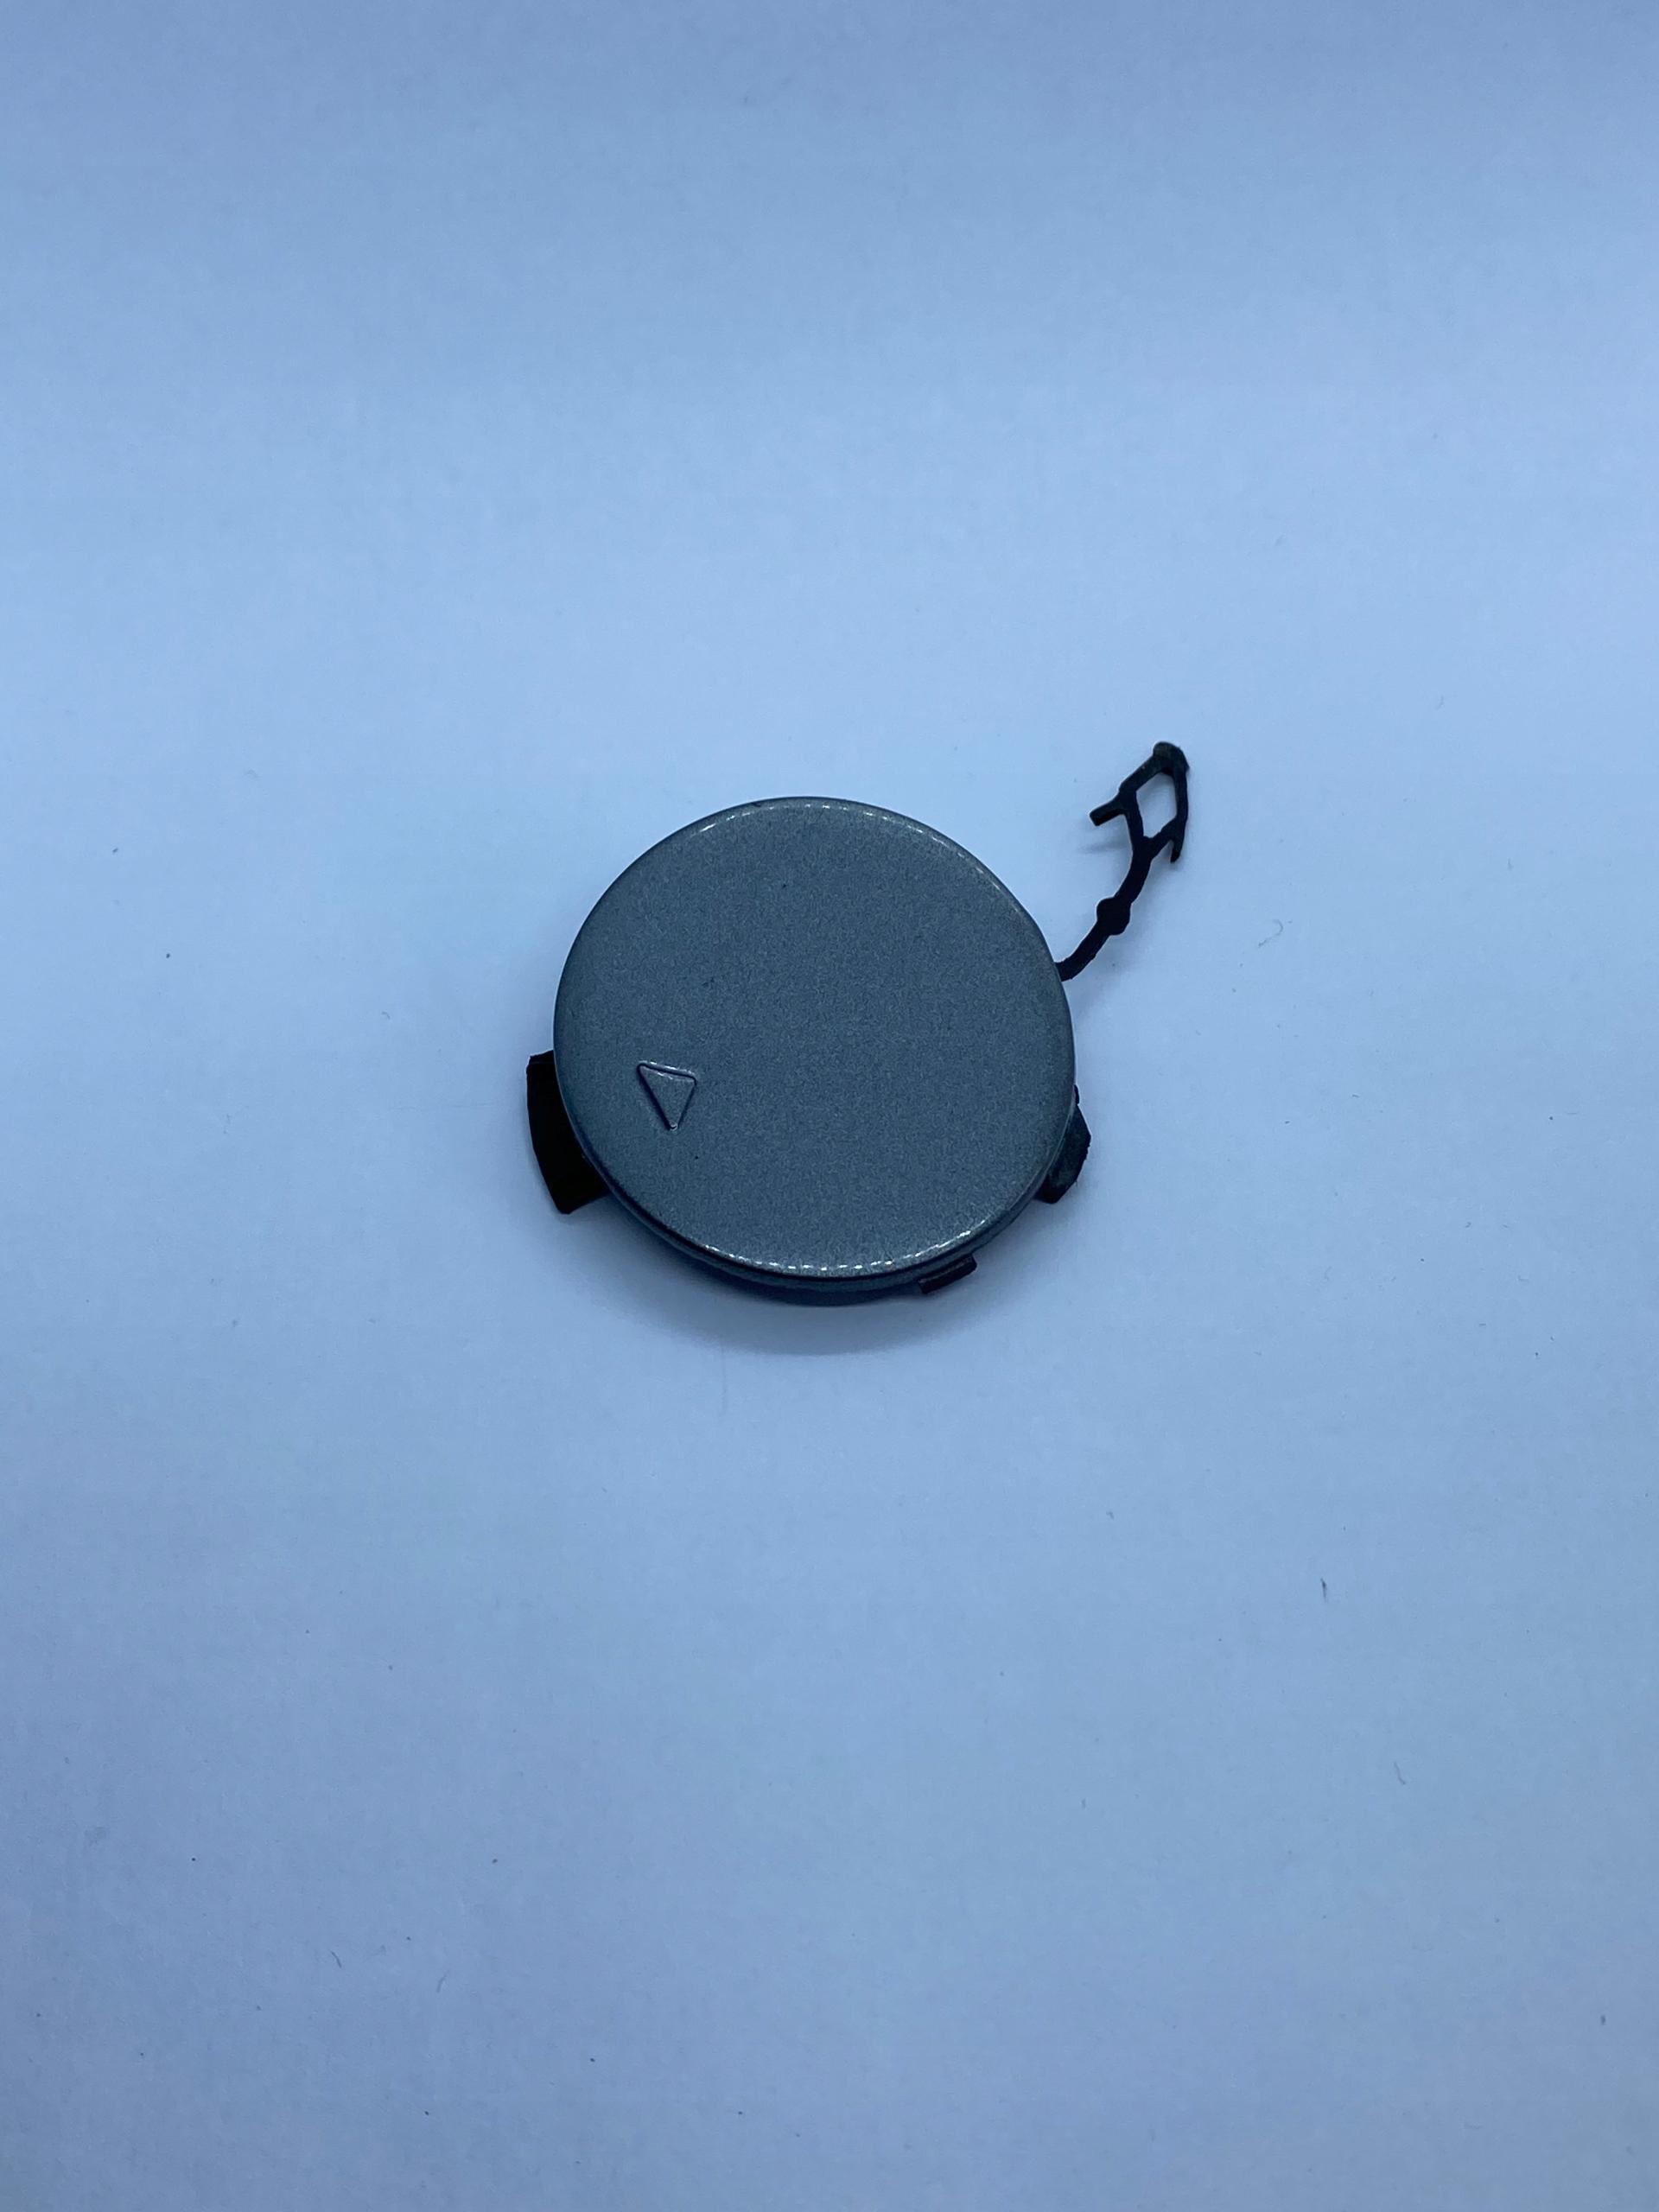 bmw e71 заглушка крюк бампер правый вперед орг p-Ń